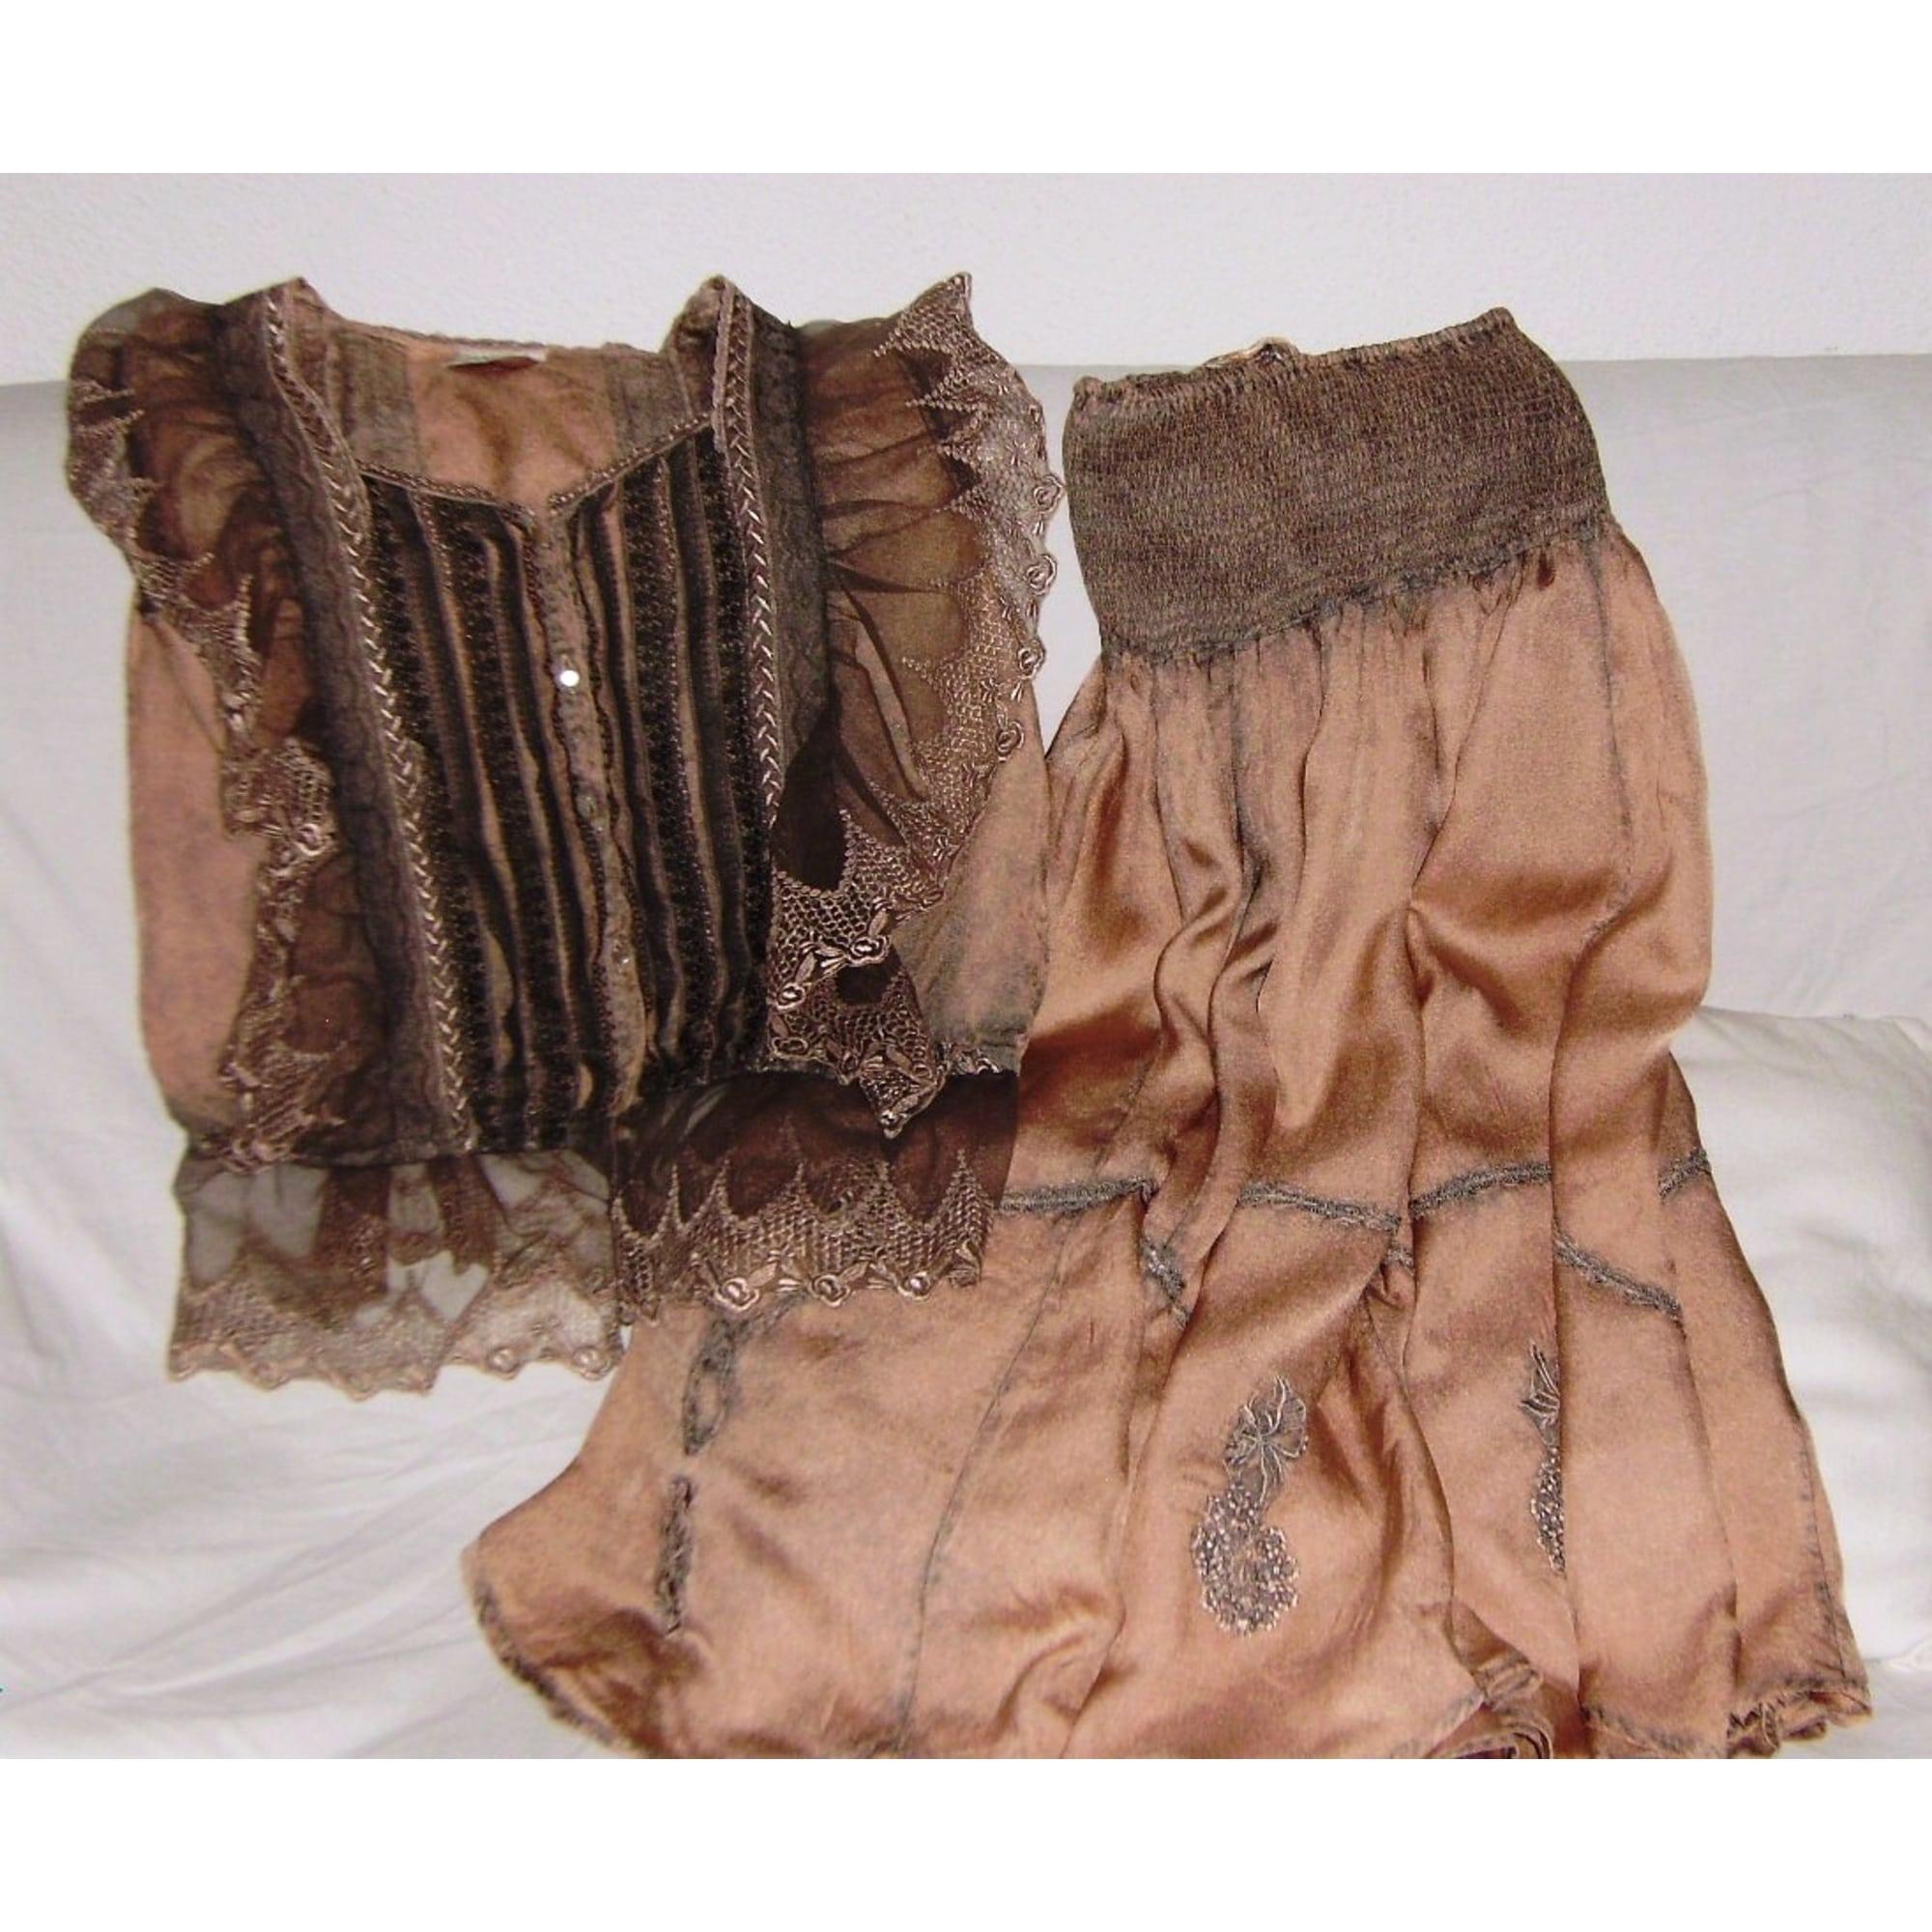 5adeebf4806053 Tailleur jupe